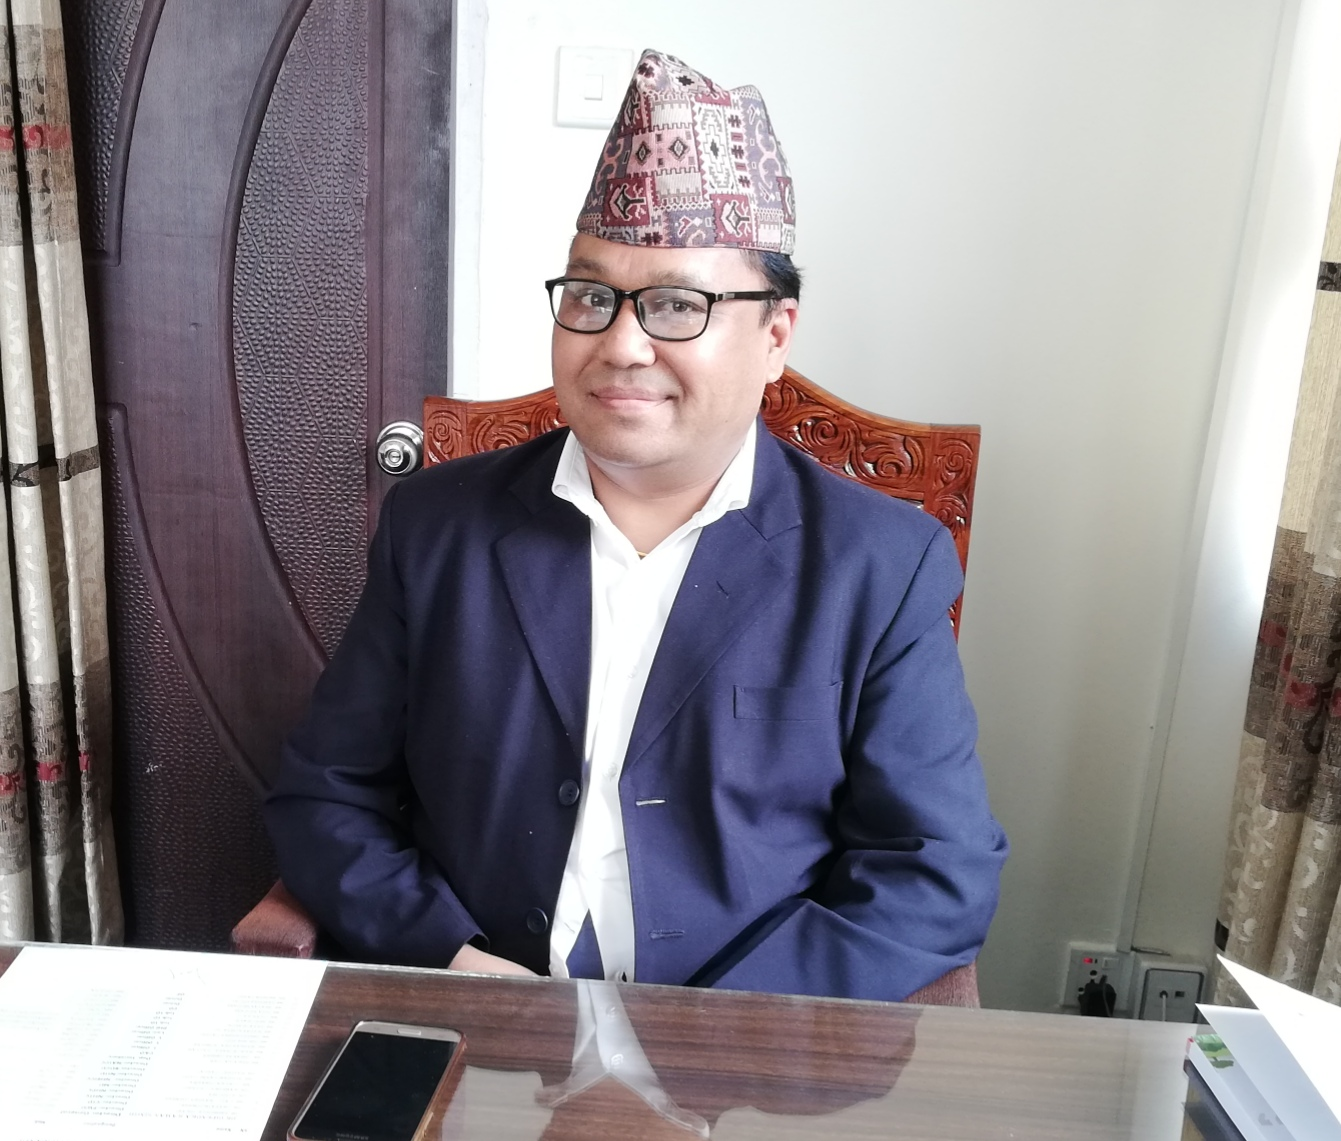 डा. दीपेन्द्र रमन सिंह